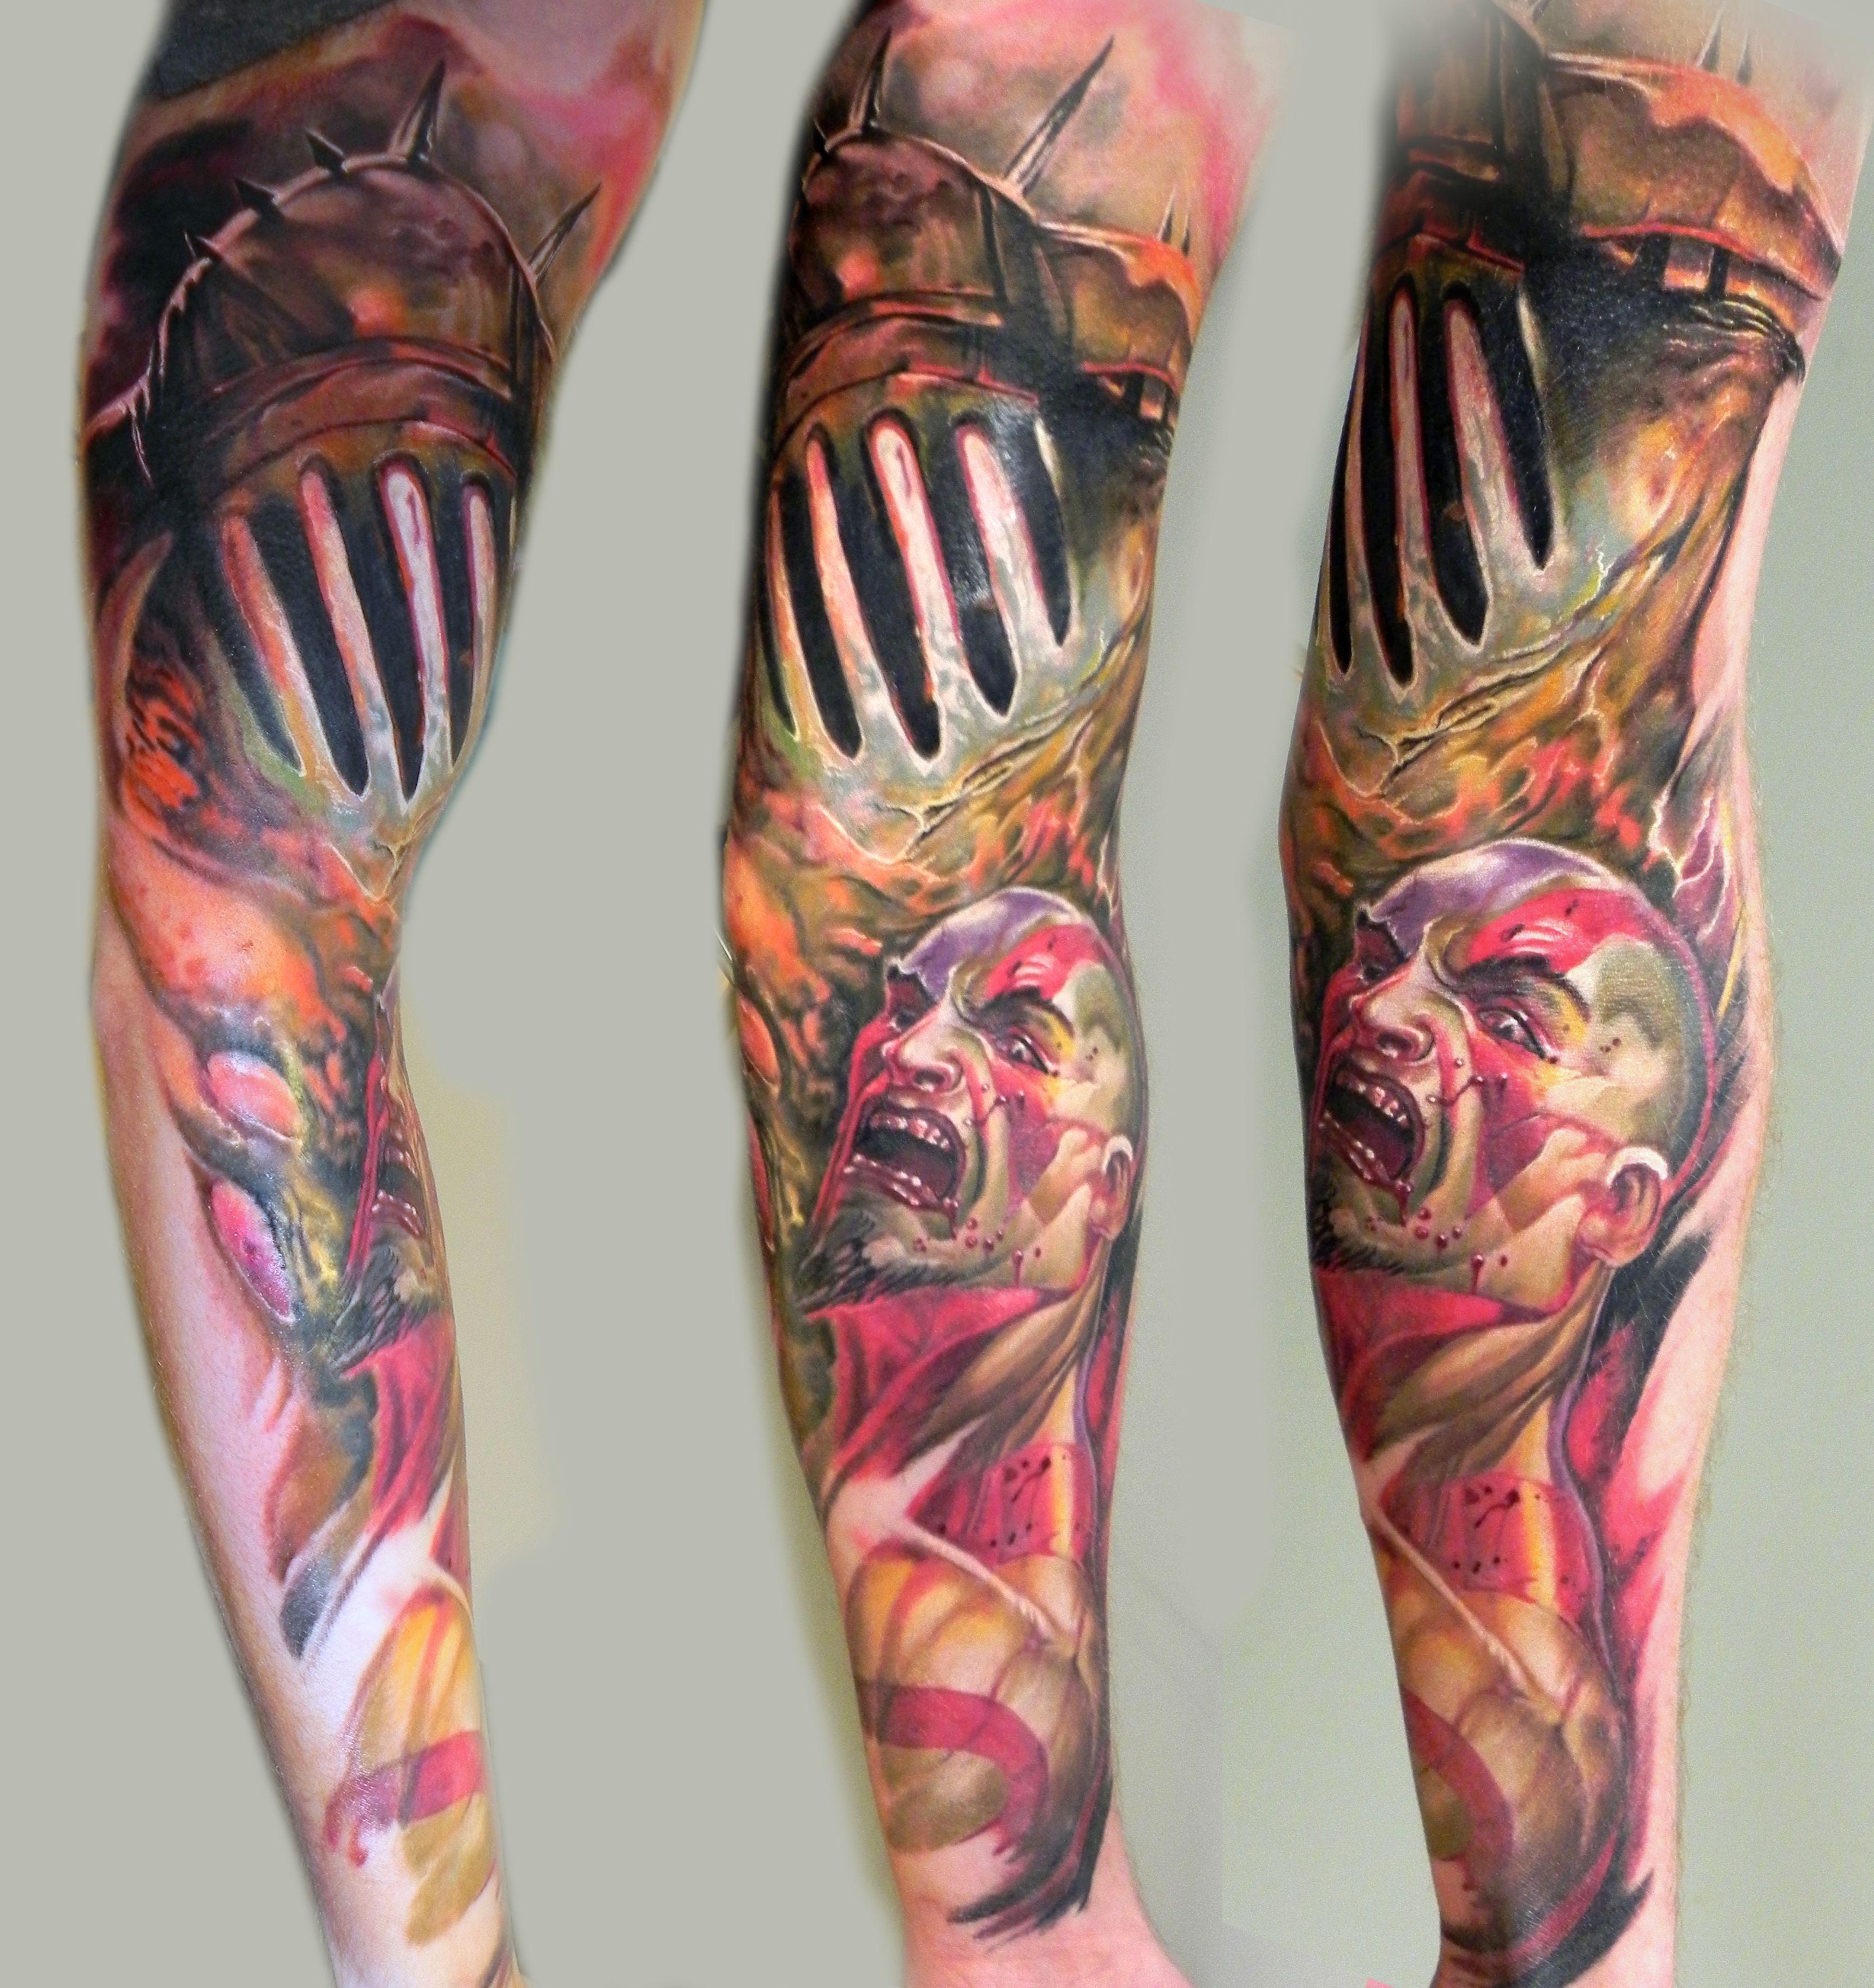 God Of War Game Theme Tattoo Ink Color Sleeve Dublin Ireland Video Game Greek Mythology Sleeve Tattoos For Women Tattoo Designs Men Sleeve Tattoos